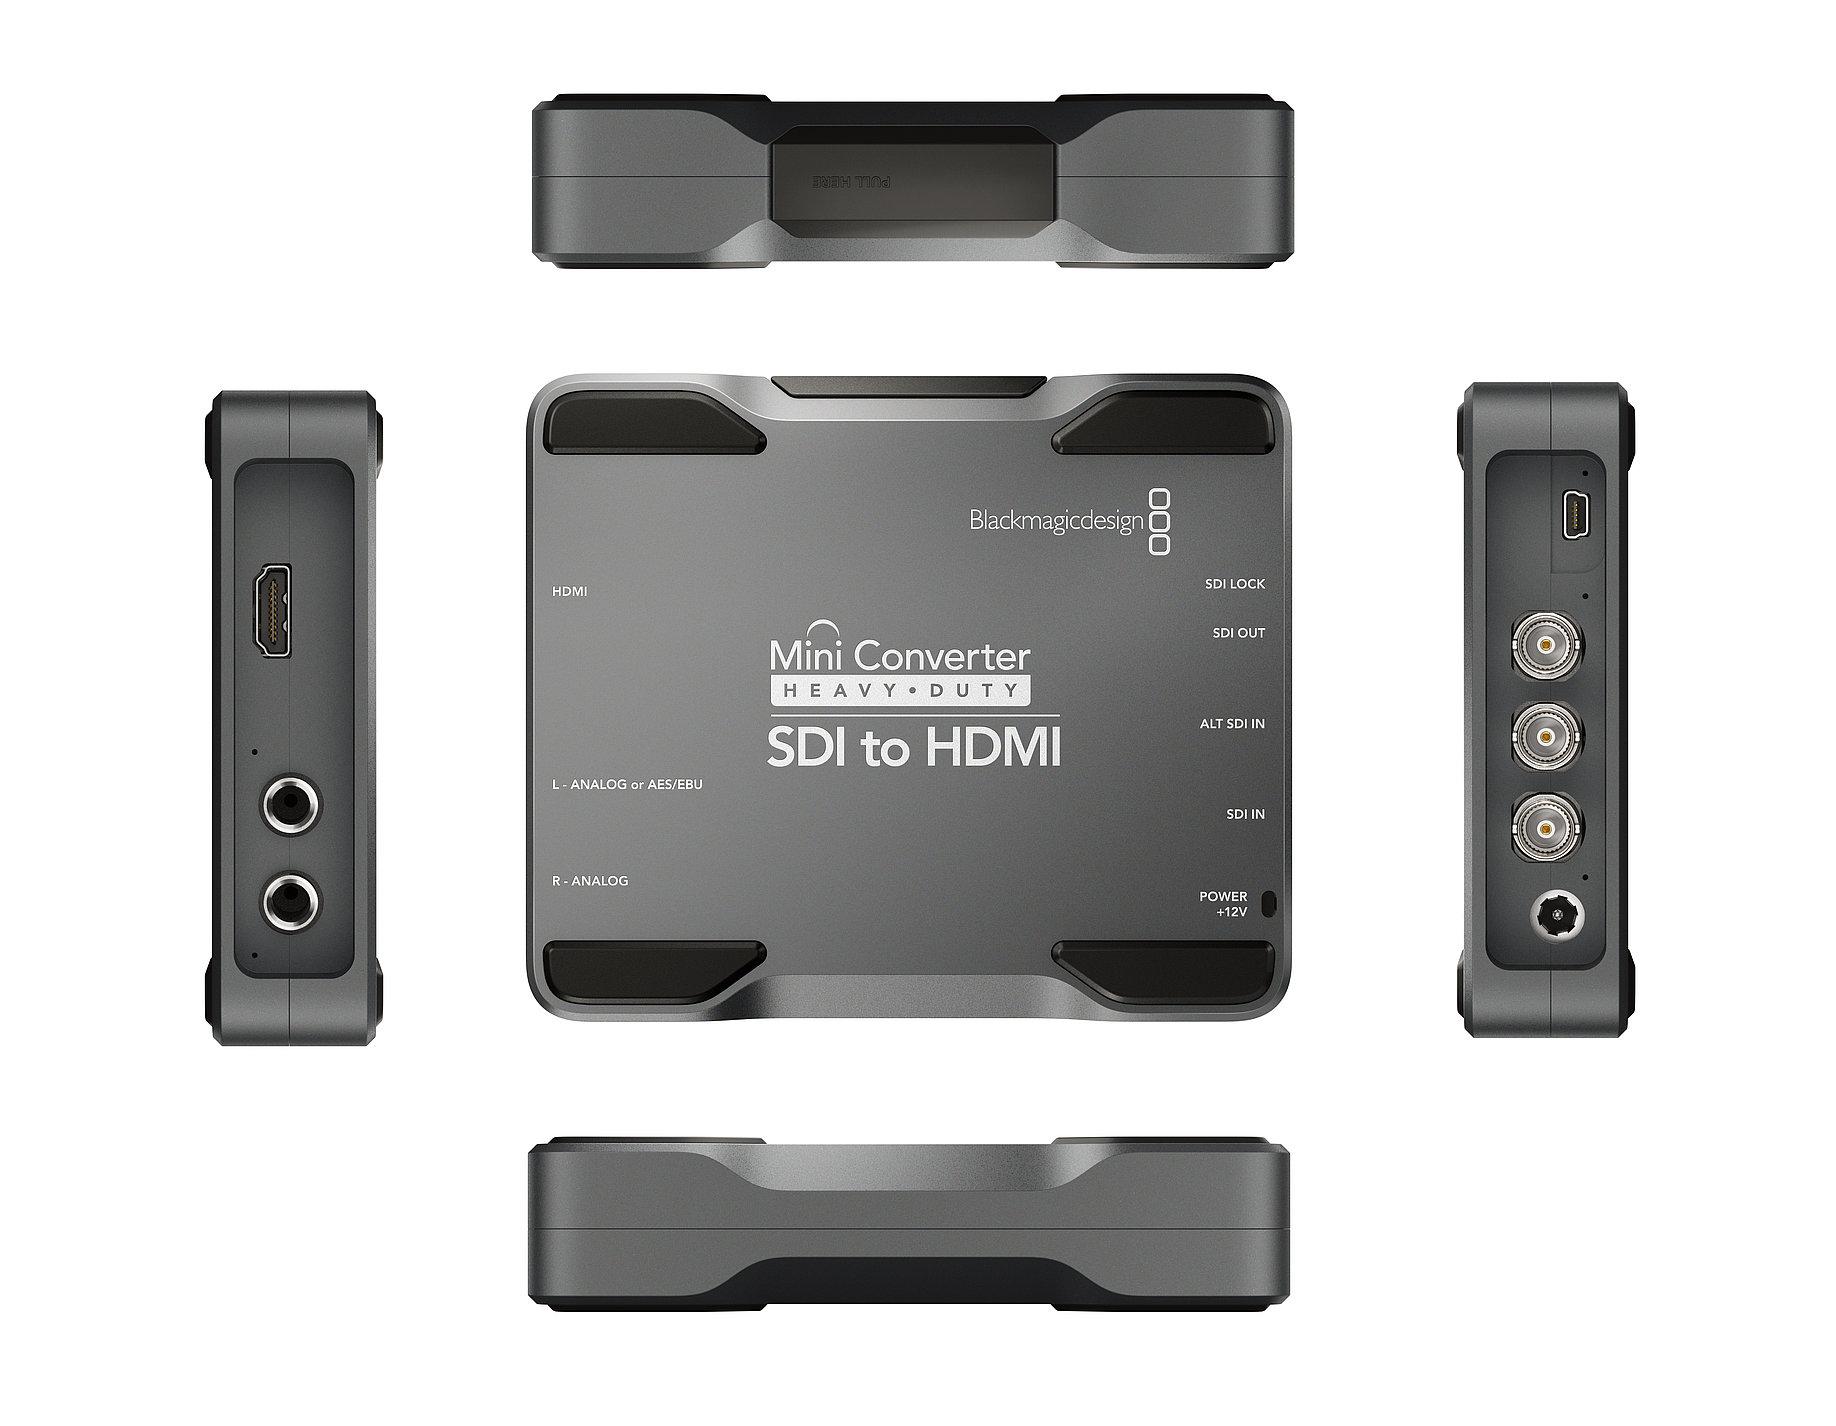 Heavy Duty Mini Converter | Red Dot Design Award